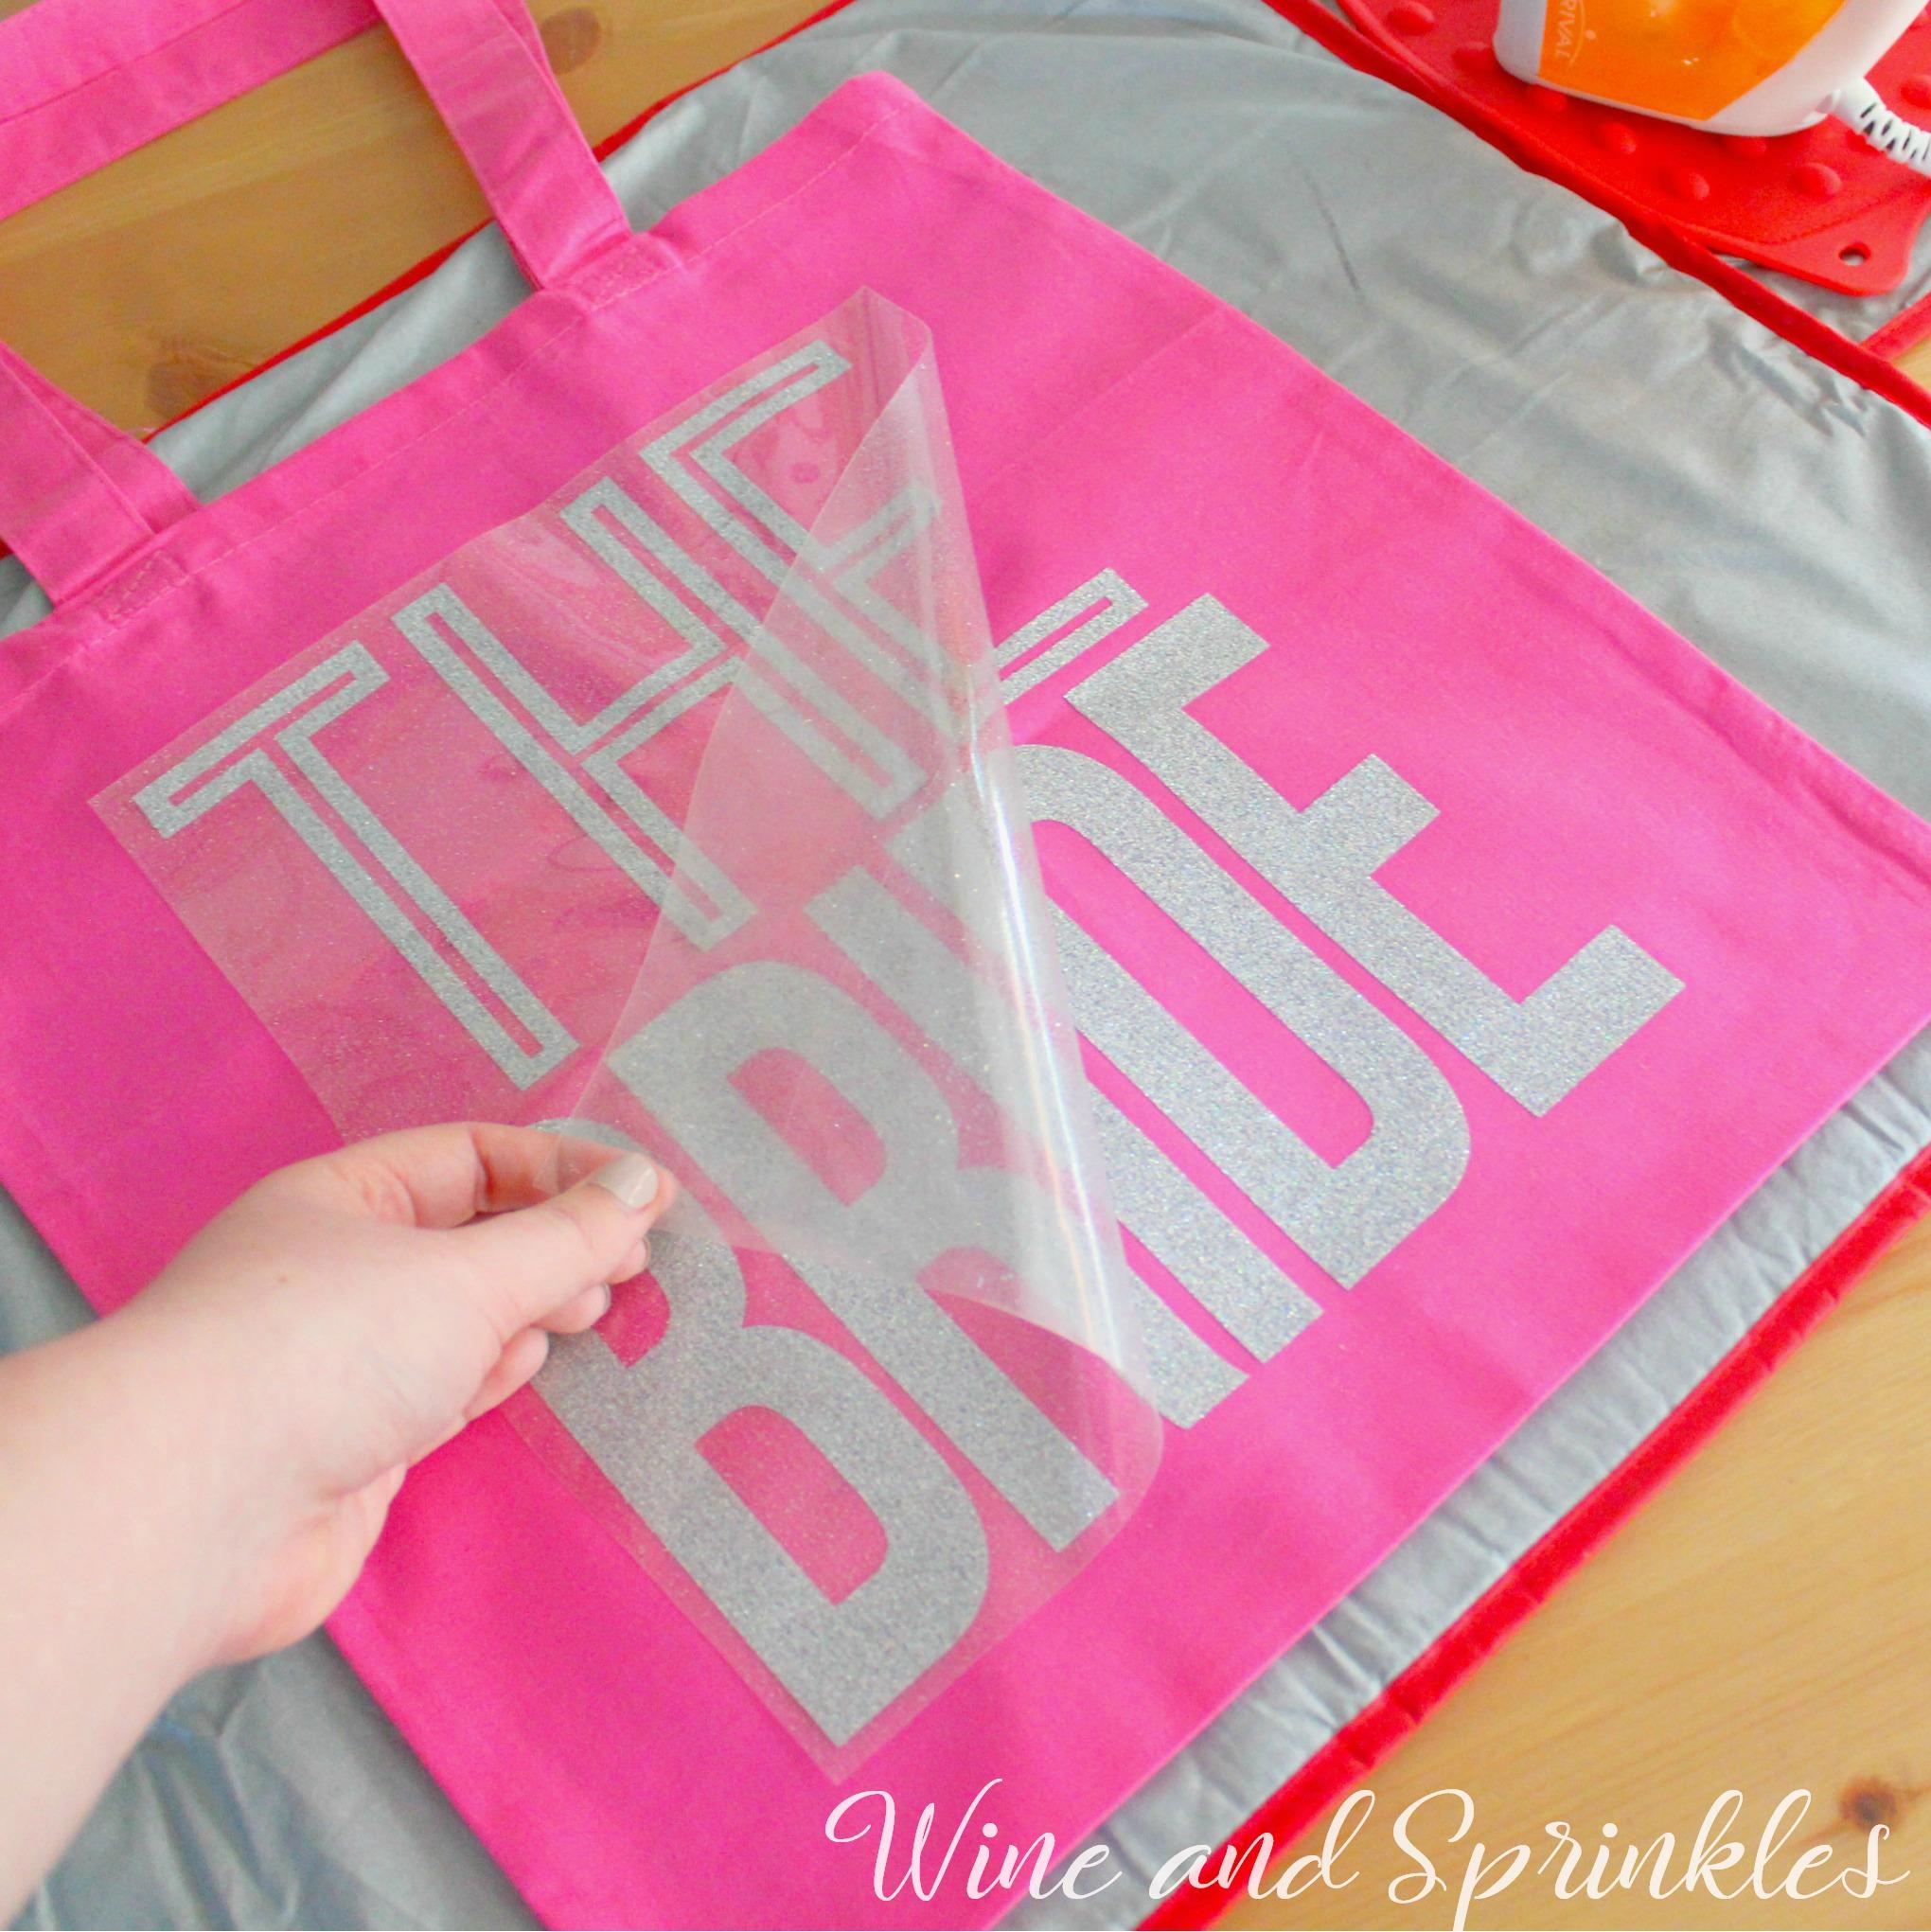 Bride Squad DIY HTV Iron On Bachelorette Tote Bags #bridesquad #bachelorette #htvvinyl